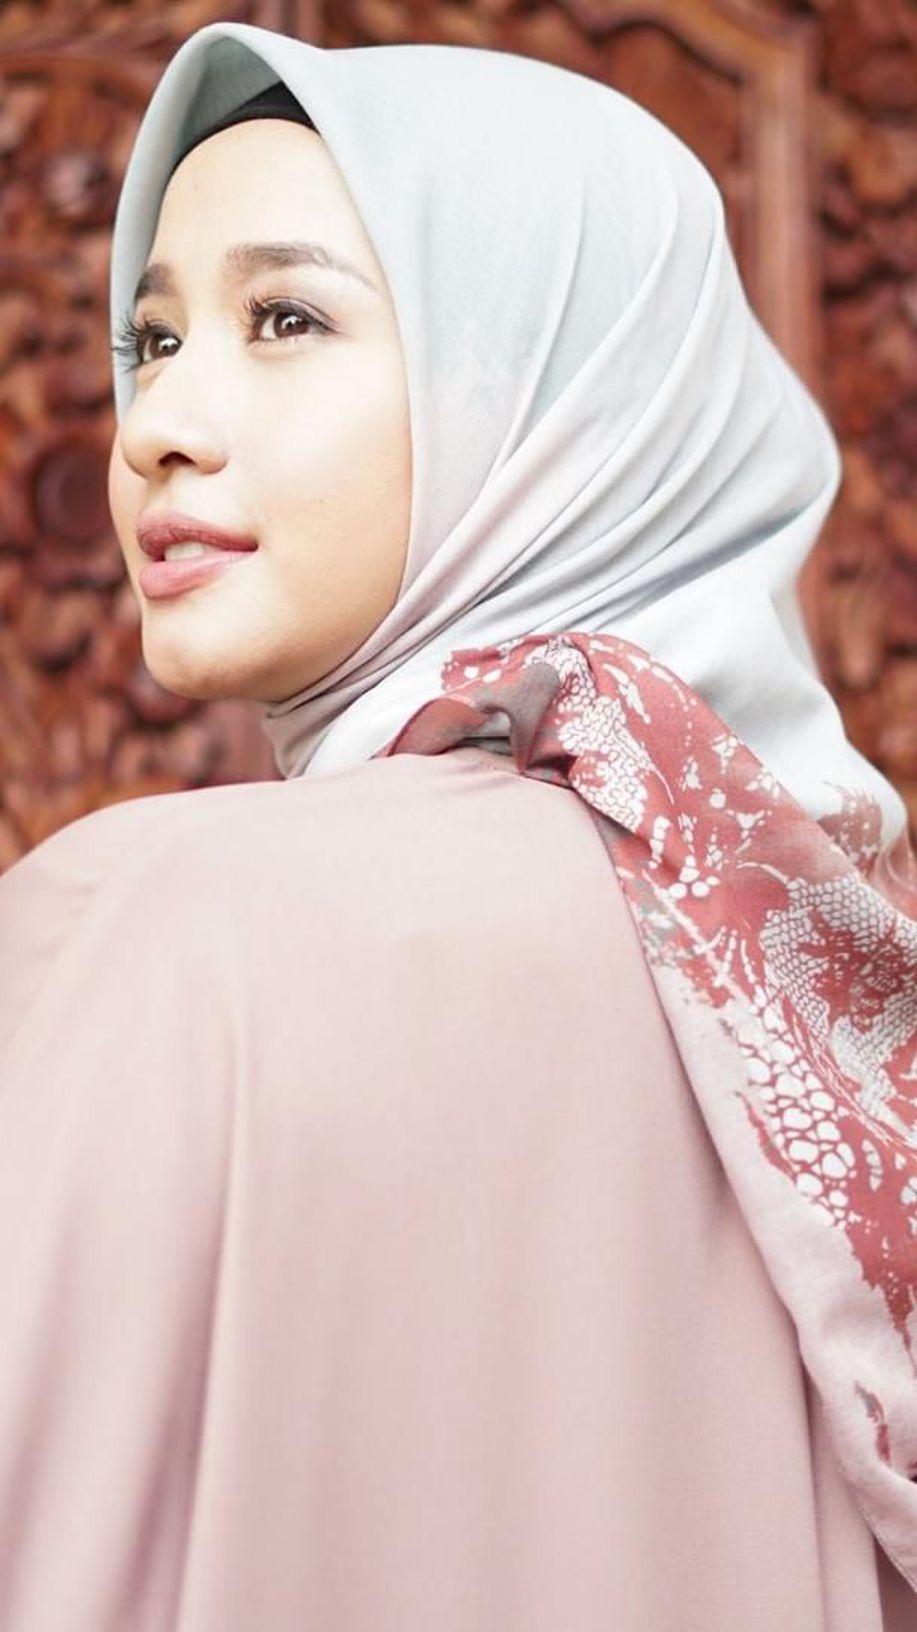 Hijab Laudya Cynthia Bella Laris Manis Jelang Lebaran, Dijual Rp 200 Ribuan https://t.co/ruD3Z20Un7 via @wolipop https://t.co/6UvwHKXKGC